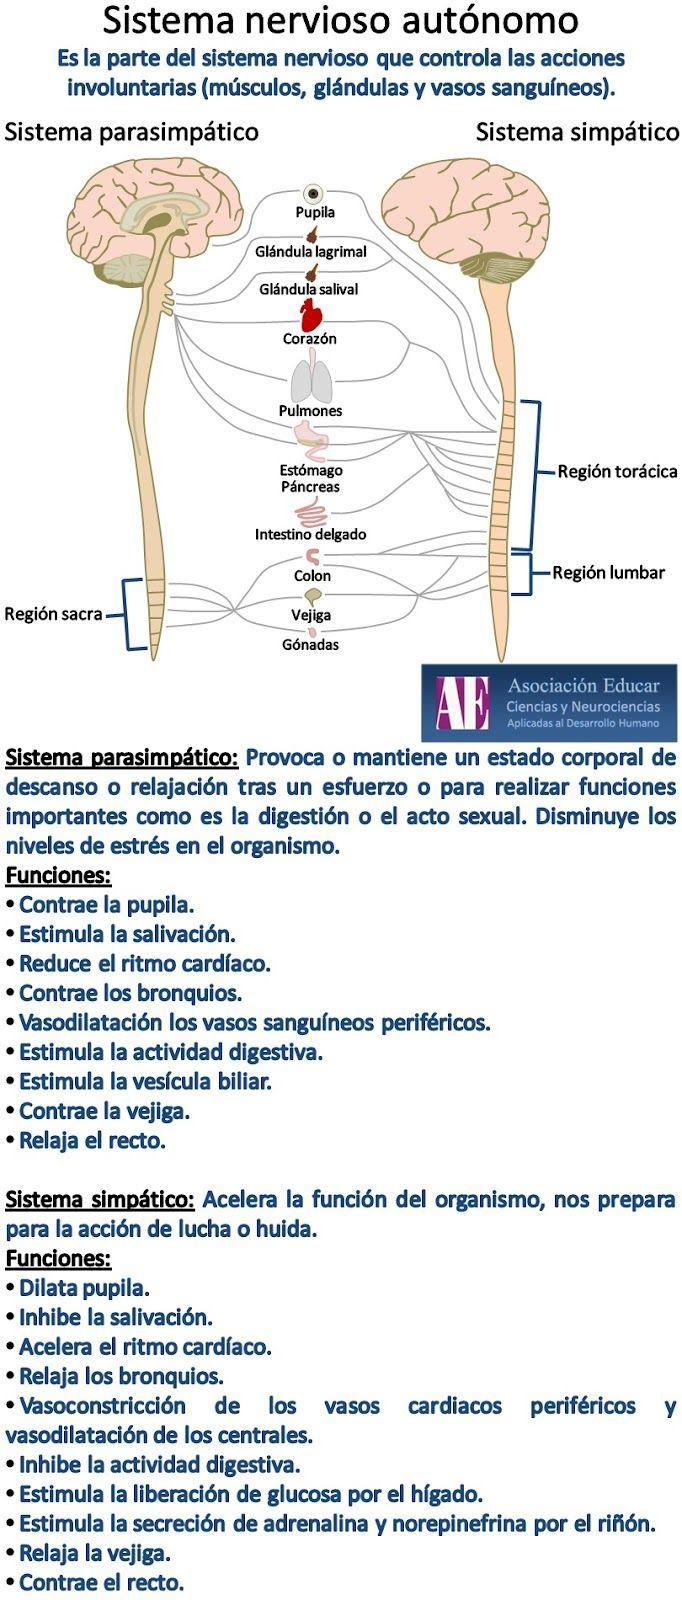 Sistema nervioso autónomo.   Prince Bonnie   Pinterest   Sistema ...